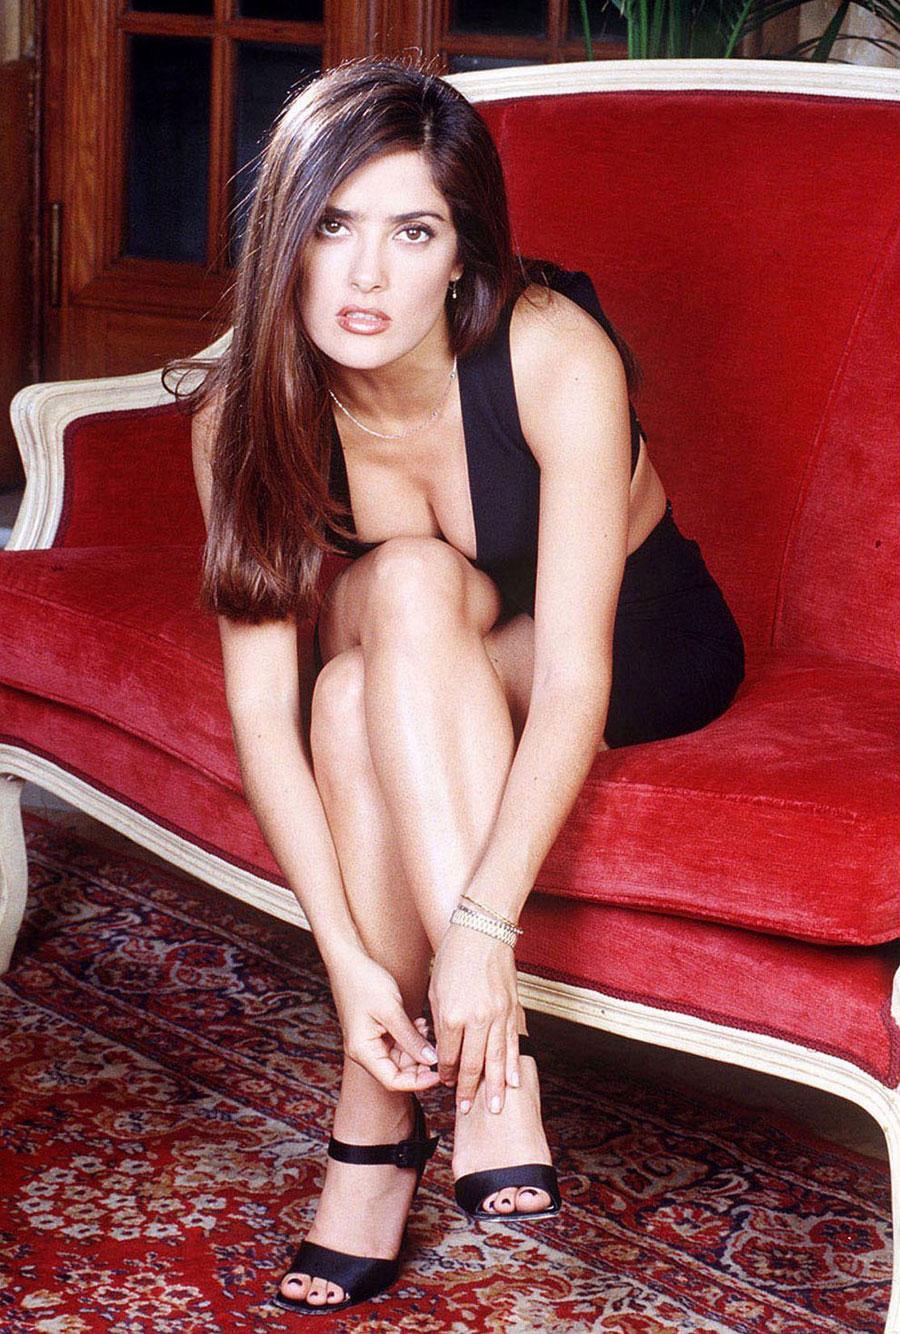 Hayek Salma Red Bikini Related Keywords & Suggestions - Hayek Salma ...